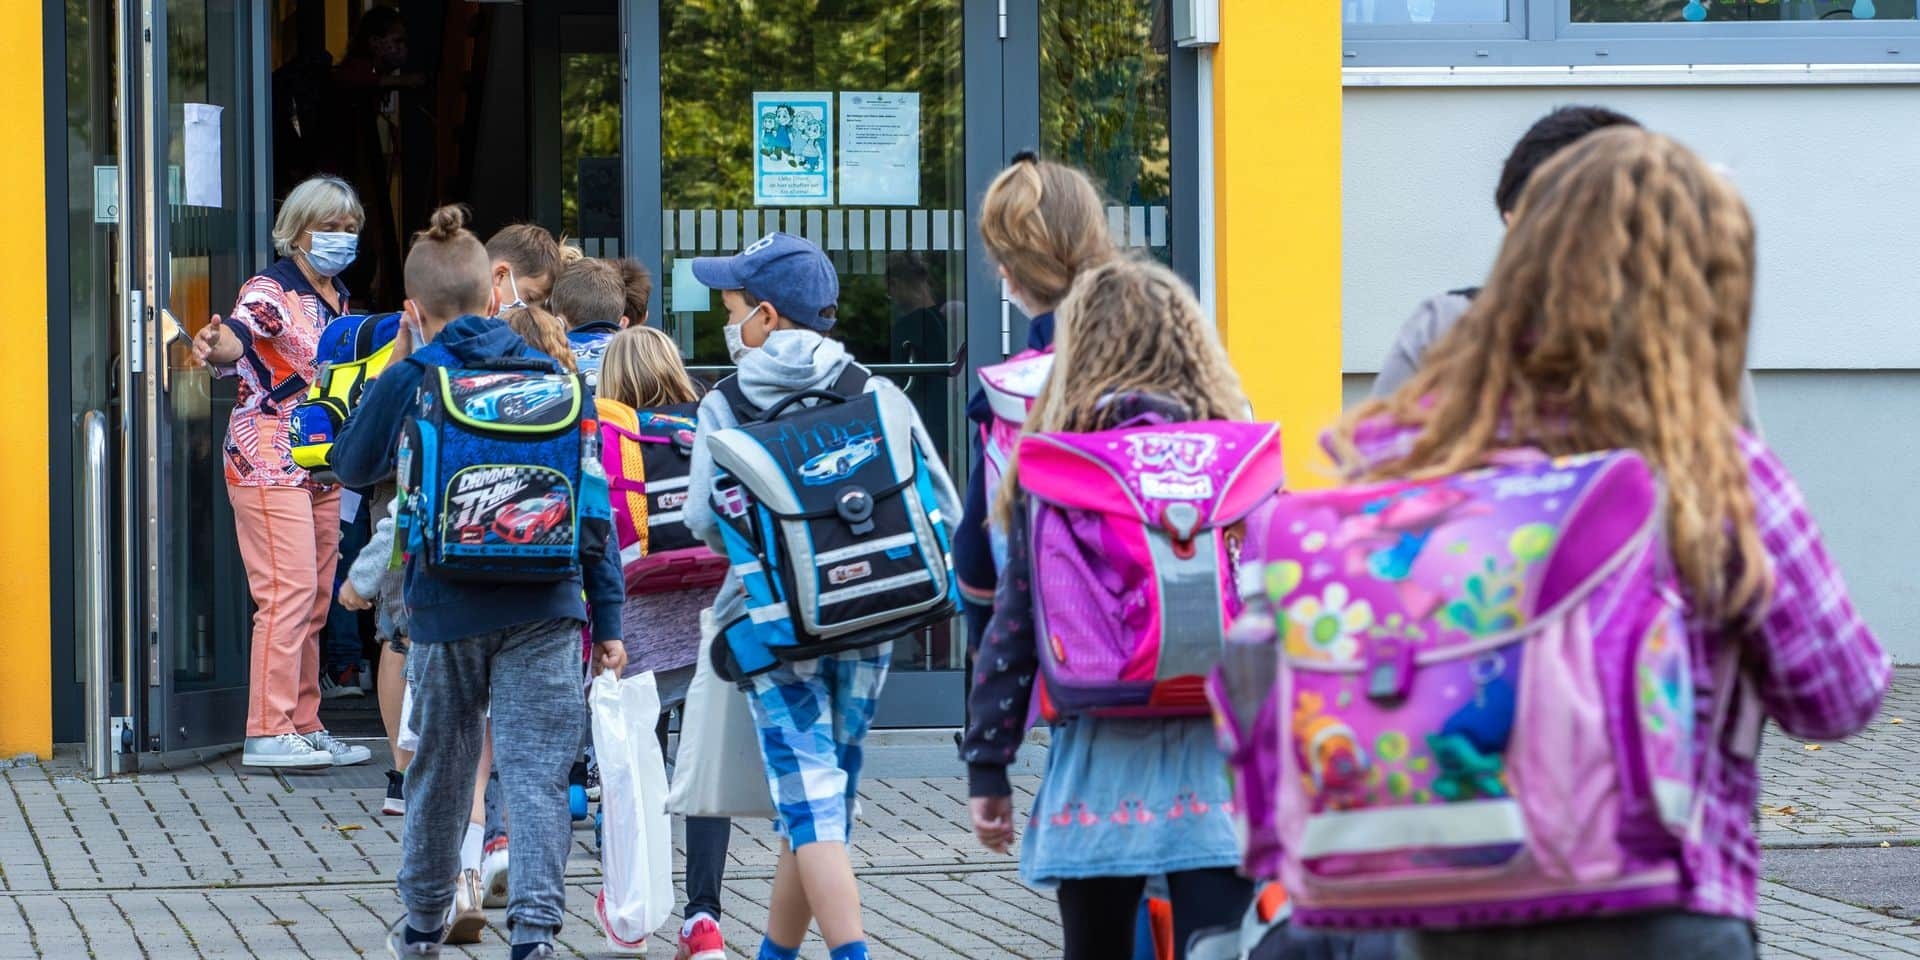 Start of school in Mecklenburg-Western Pomerania